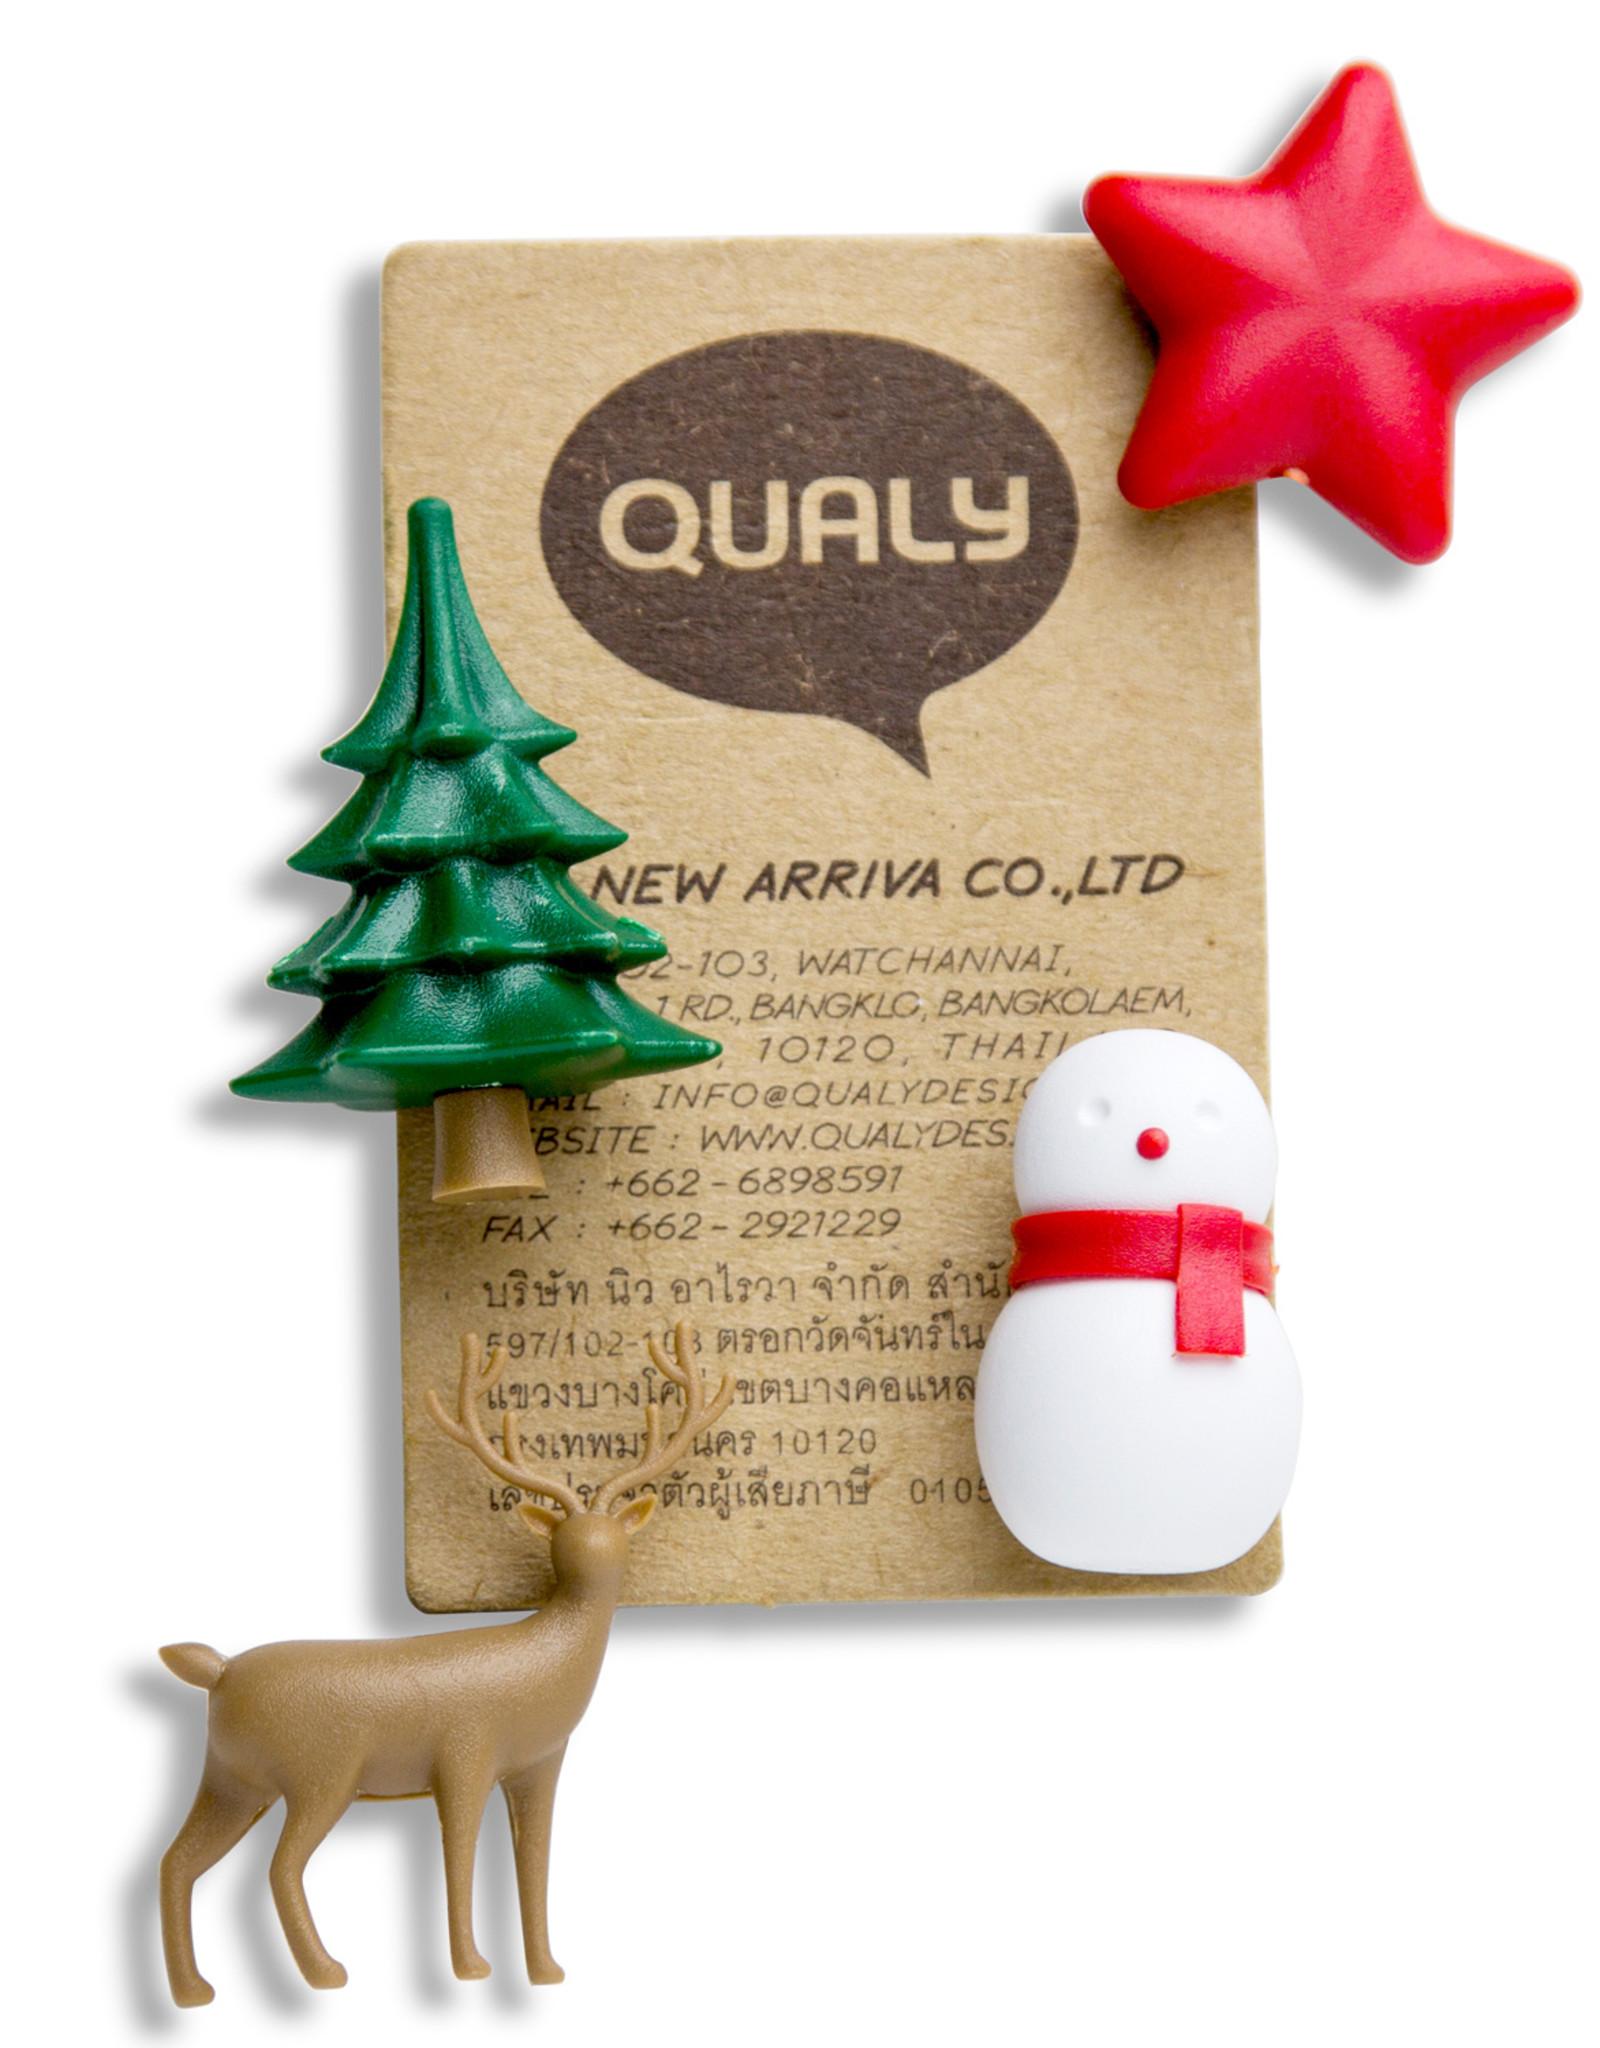 Qualy Winter Wonder Magneten 4 stuks